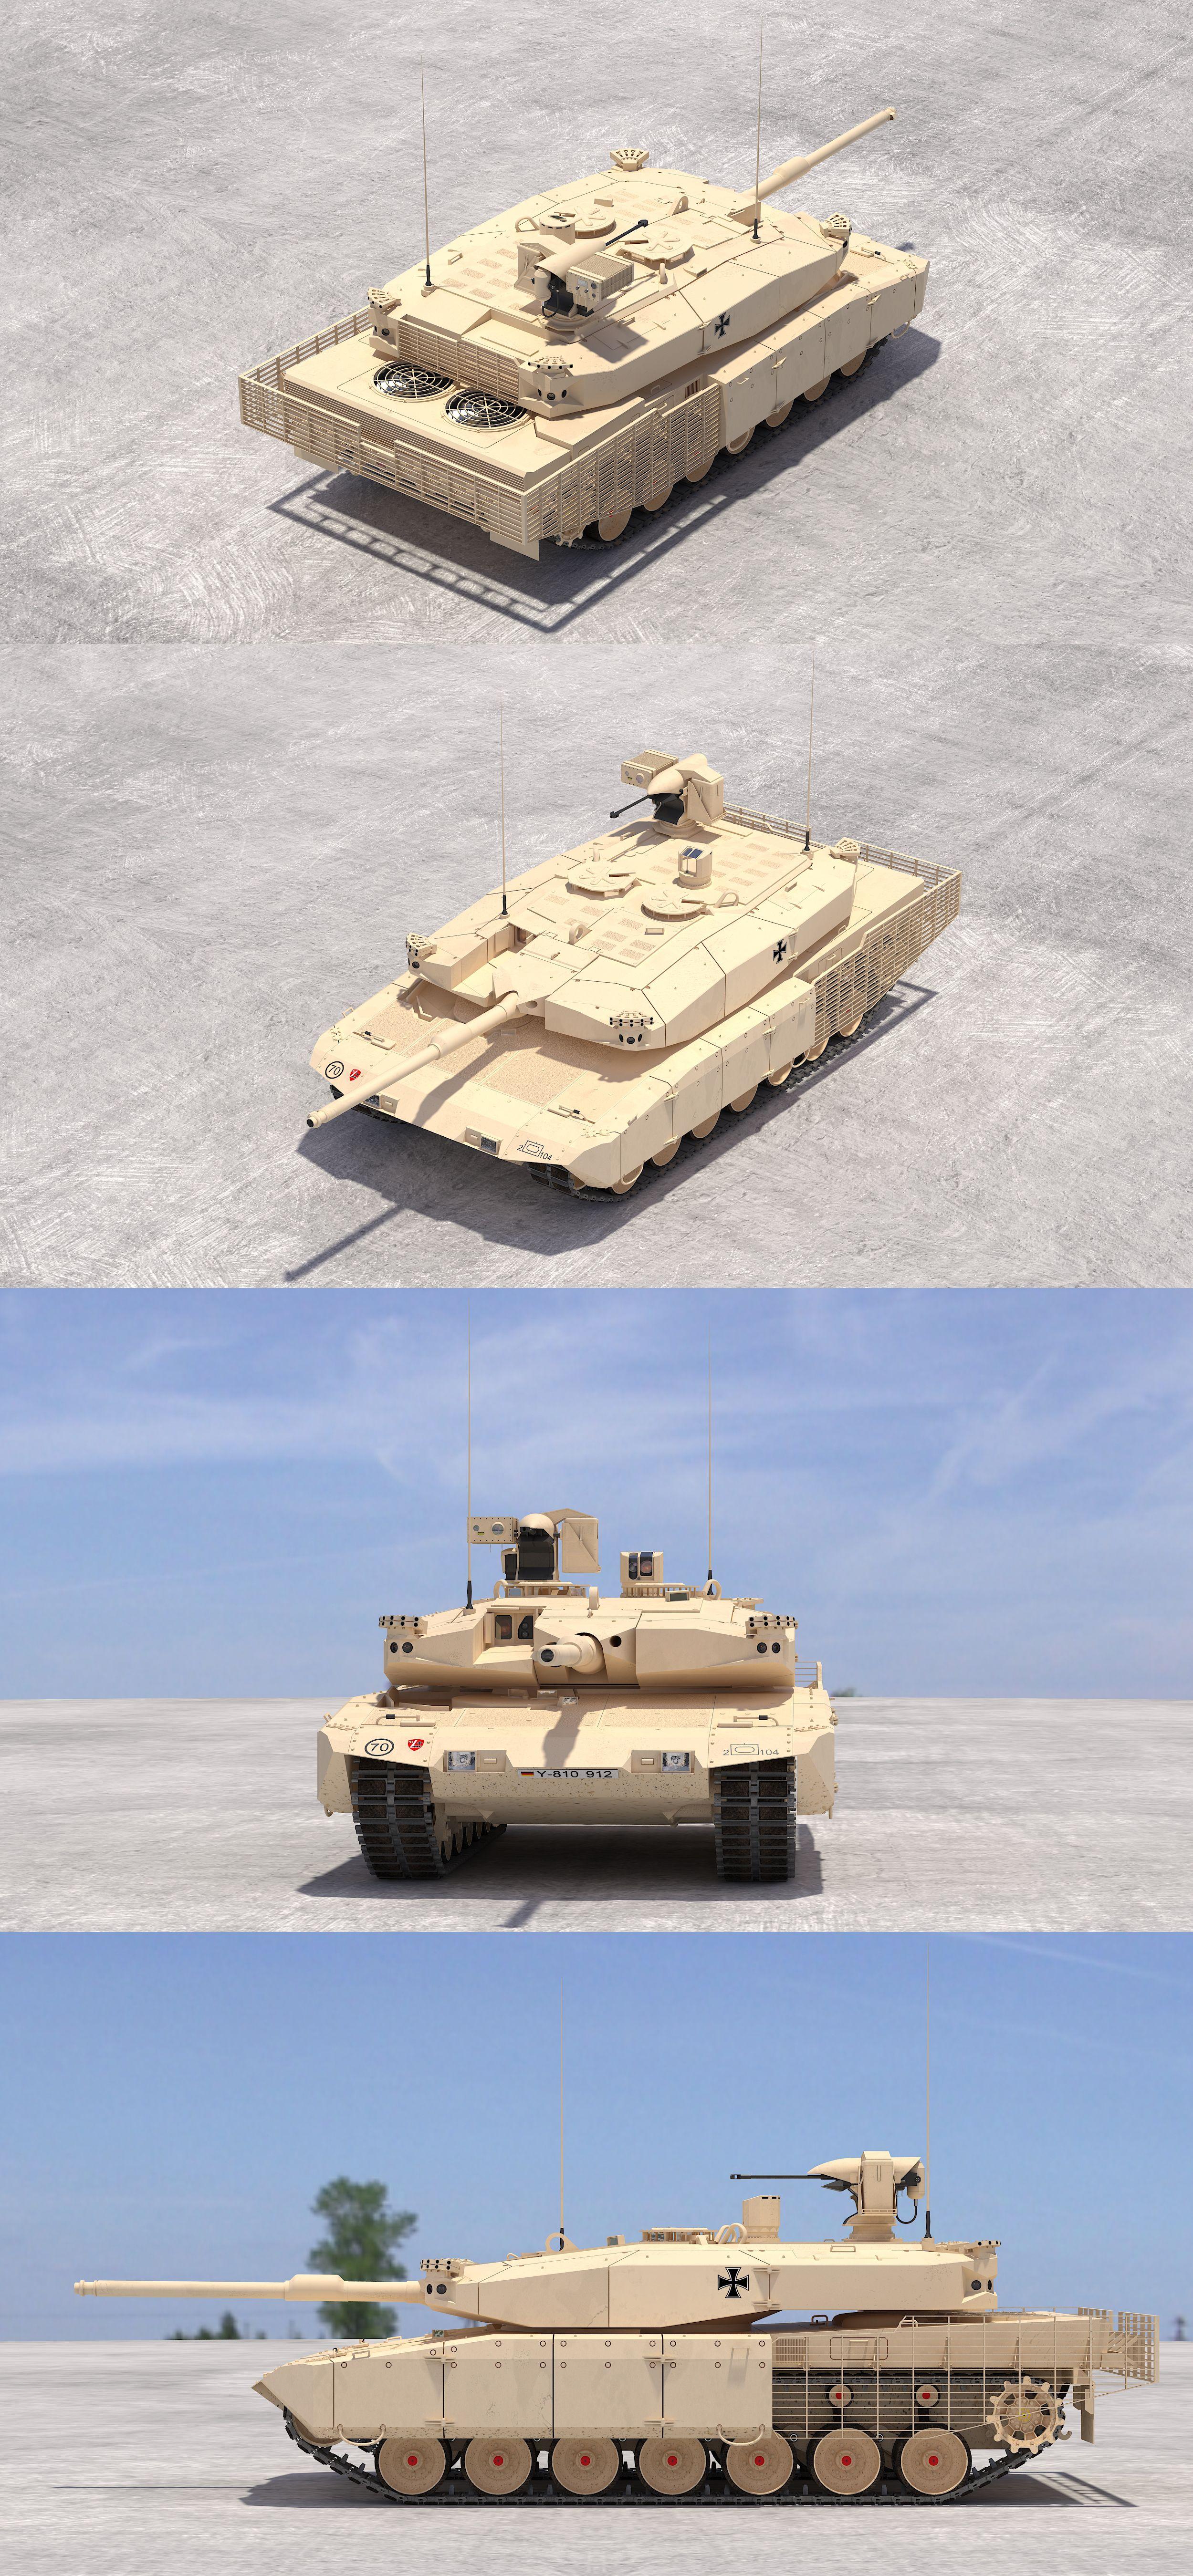 5ec3dbed0b0c Leopard 2 MBT Revolution(Desert Tone)  3Dmodel  3Dartist  Tank  Collection   3Dsmax  Vray